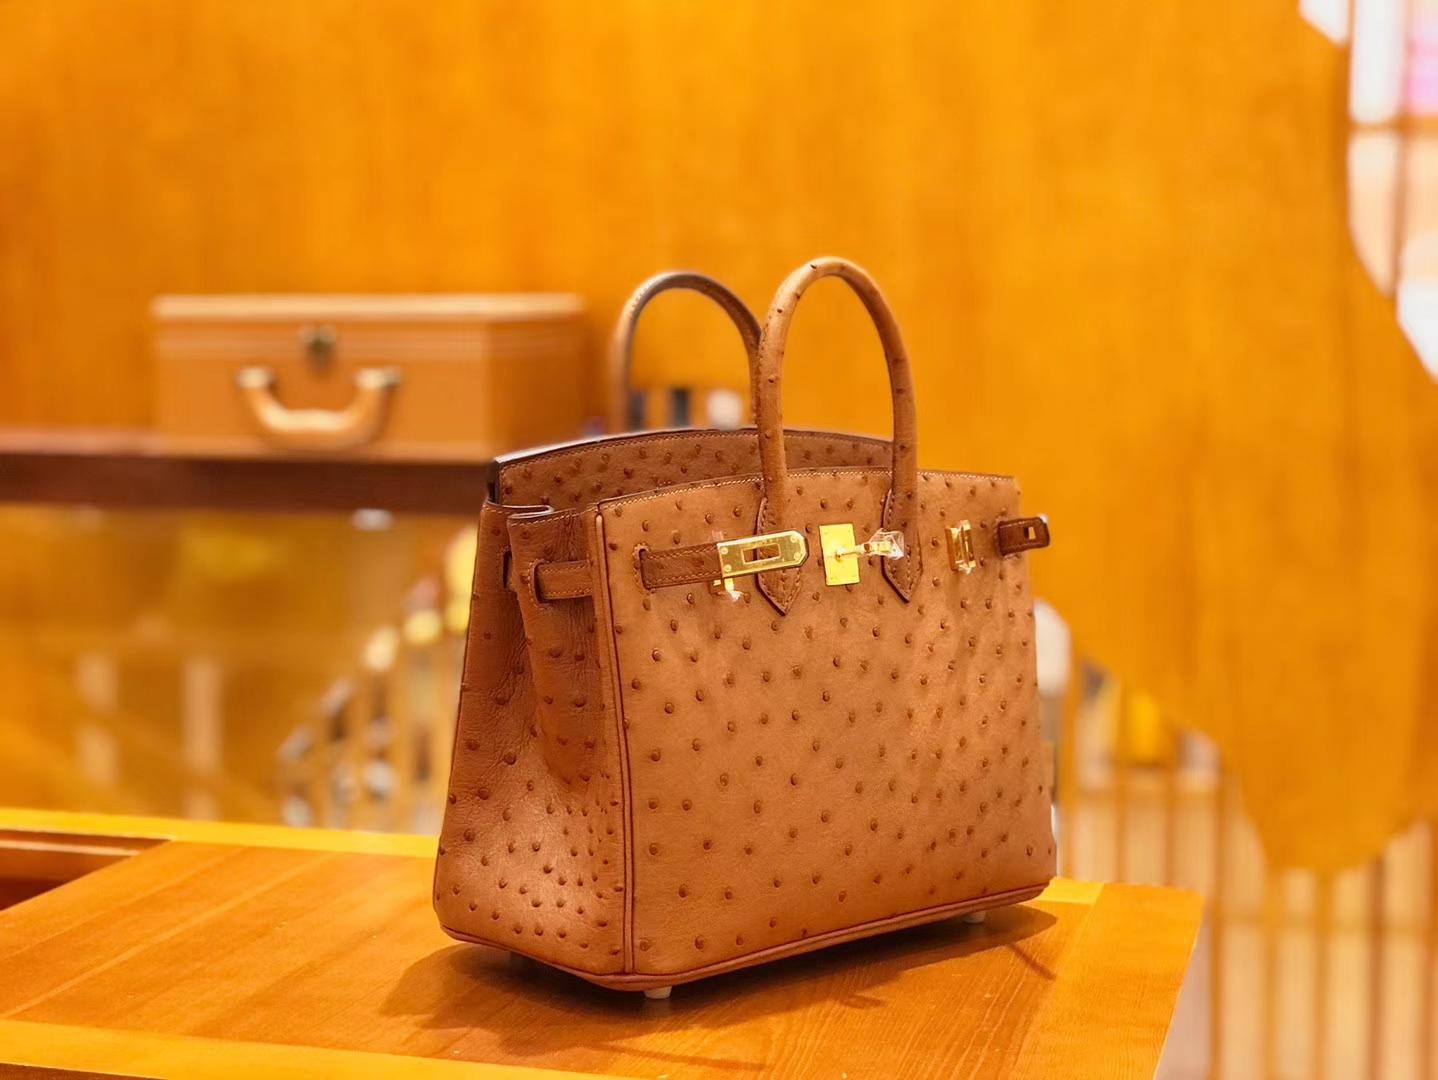 Hermès(爱马仕)Birkin 25cm 鸵鸟皮 金棕色 全手工缝制 现货